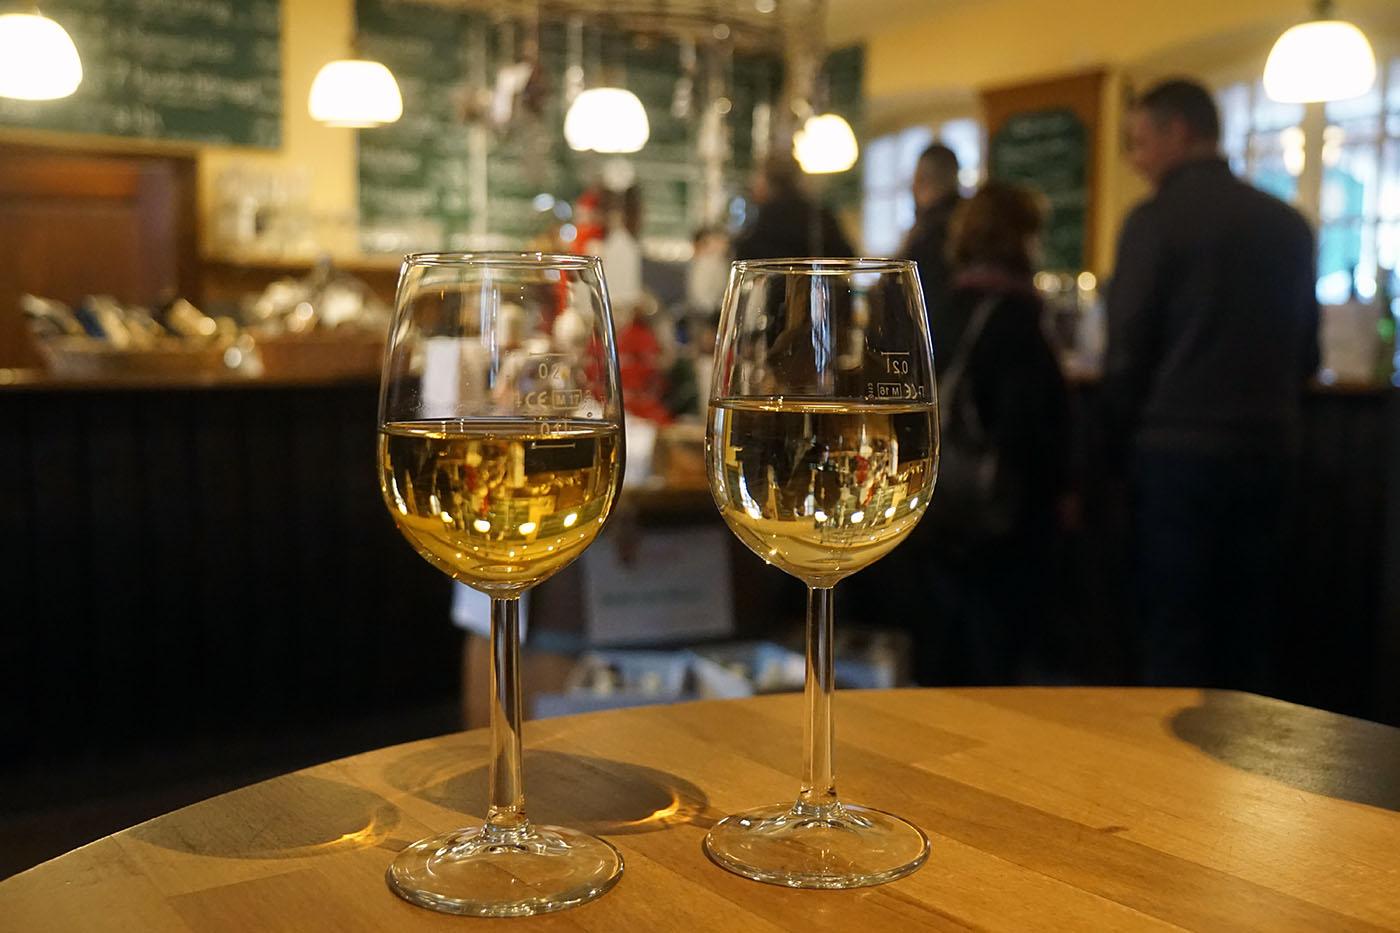 Weinstube Kesselstatt